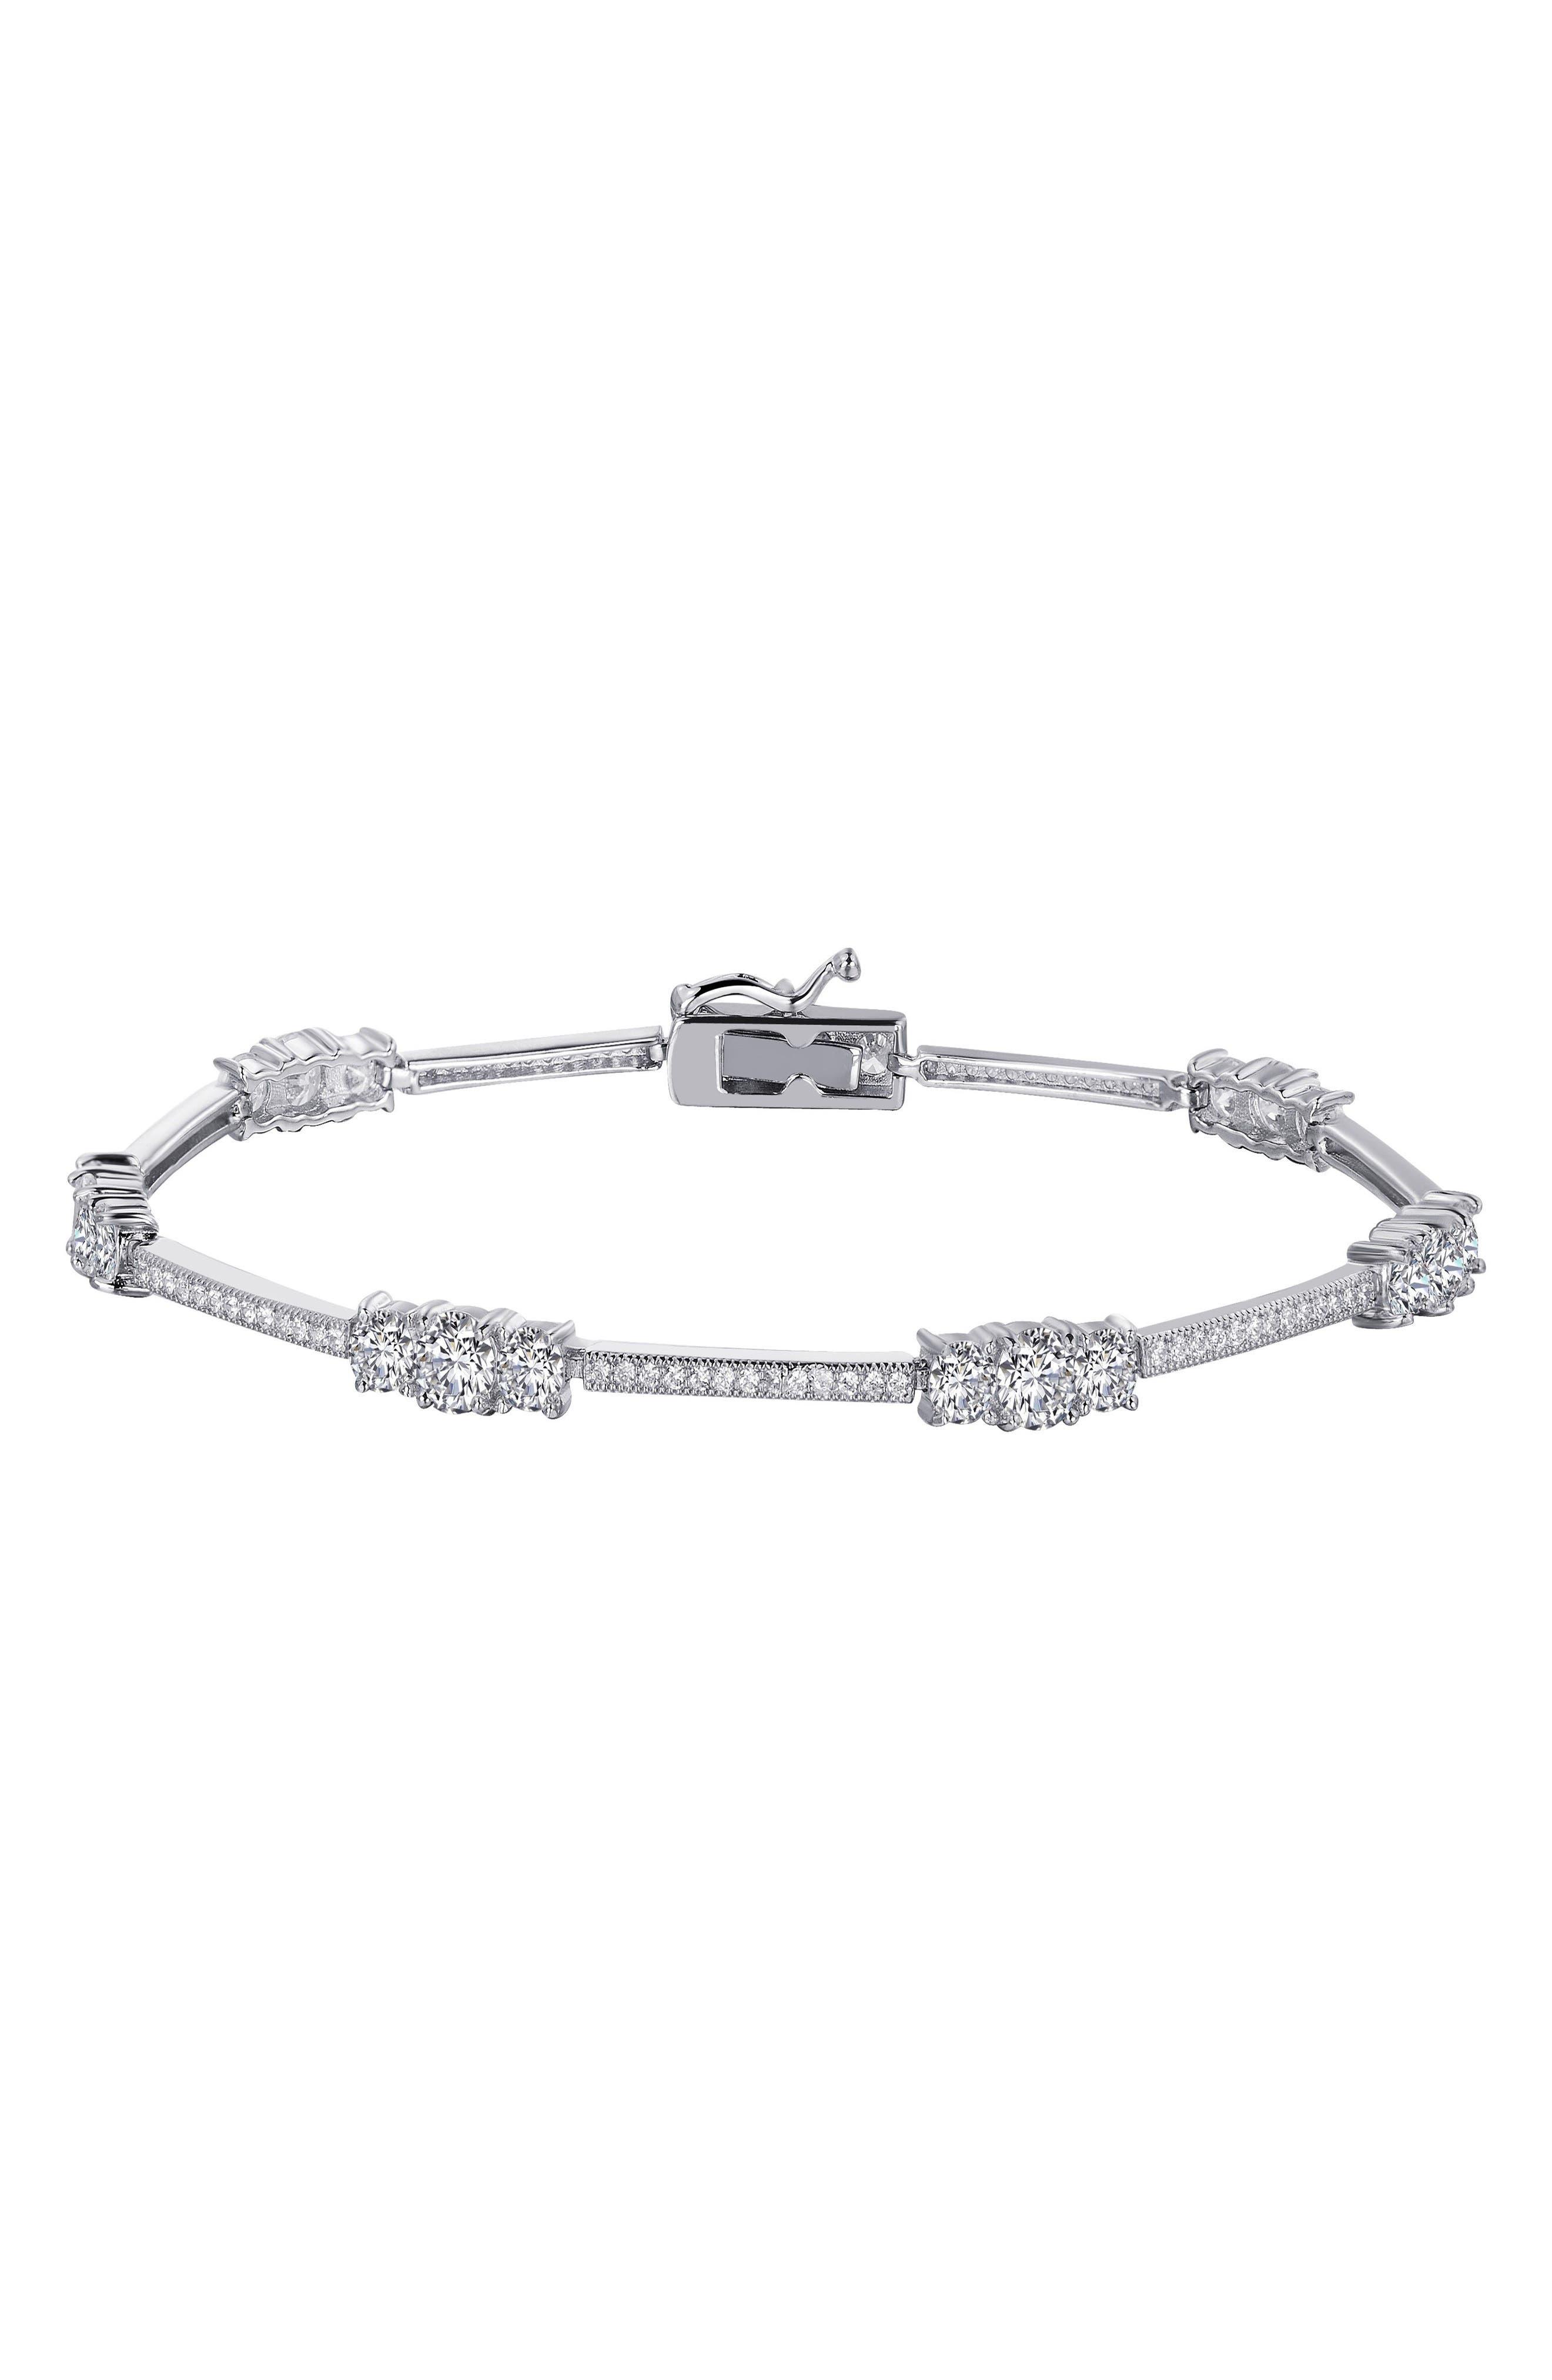 Simulated Diamond Tennis Bracelet,                         Main,                         color, 100